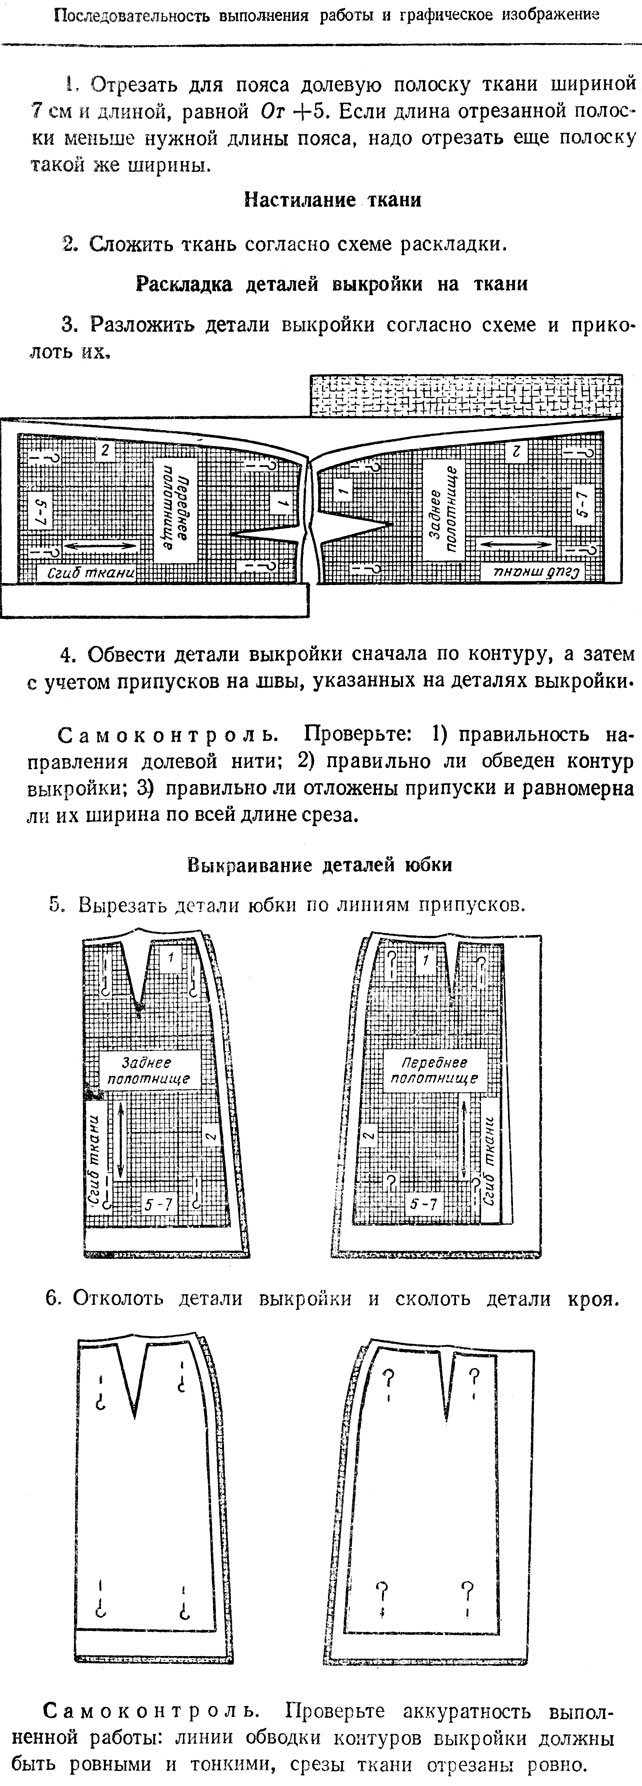 http://pedagogic.ru/books/item/f00/s00/z0000053/pic/000097.jpg